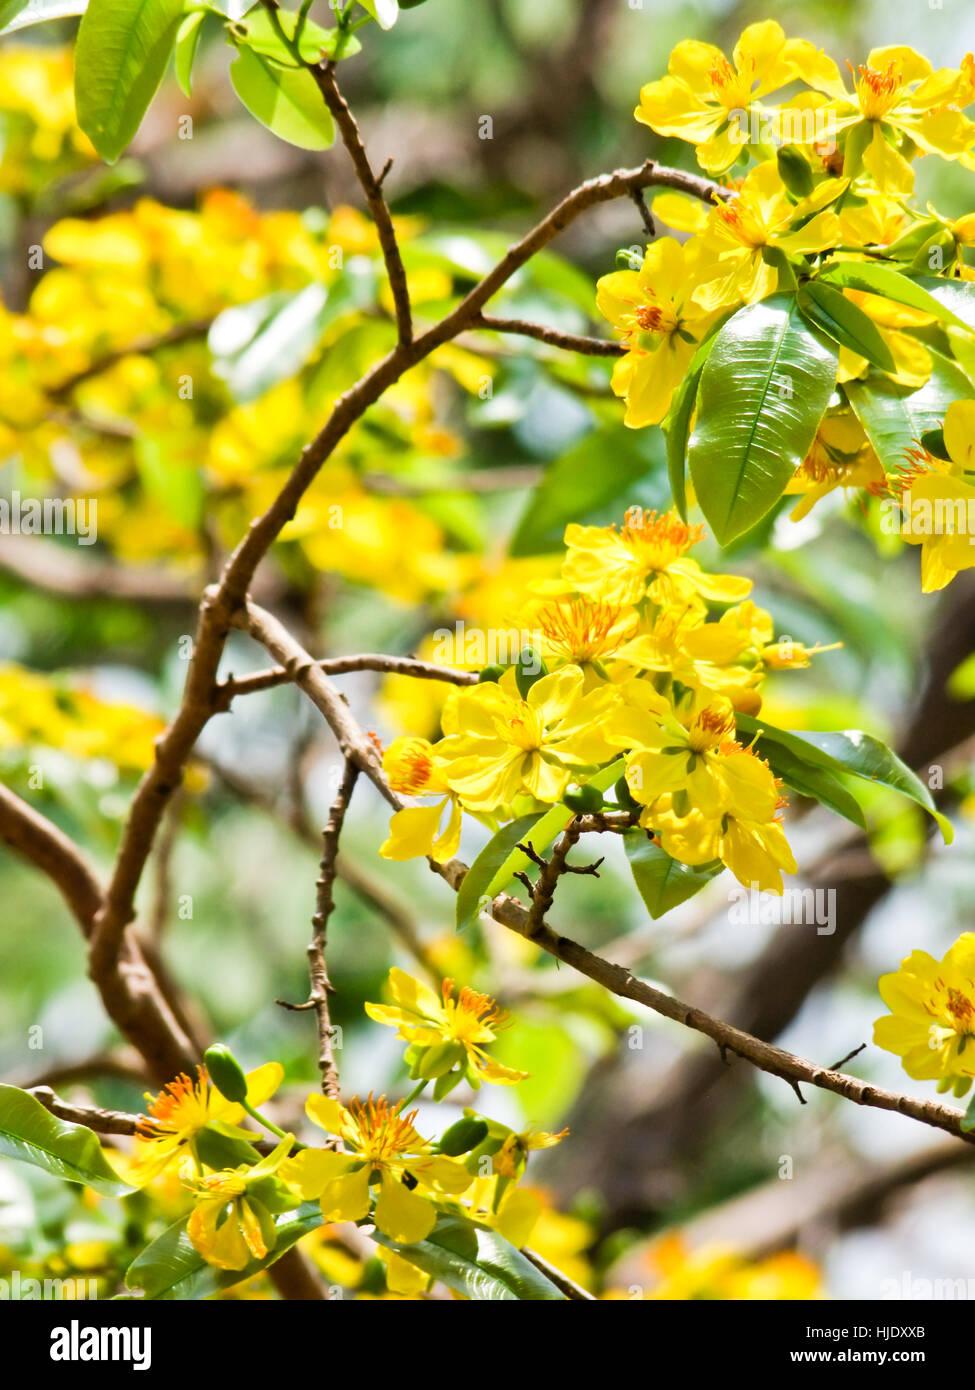 Cassod tree and thai copper pod stock photos cassod tree and thai food aliment tree trees flower plant leaves flowers mightylinksfo